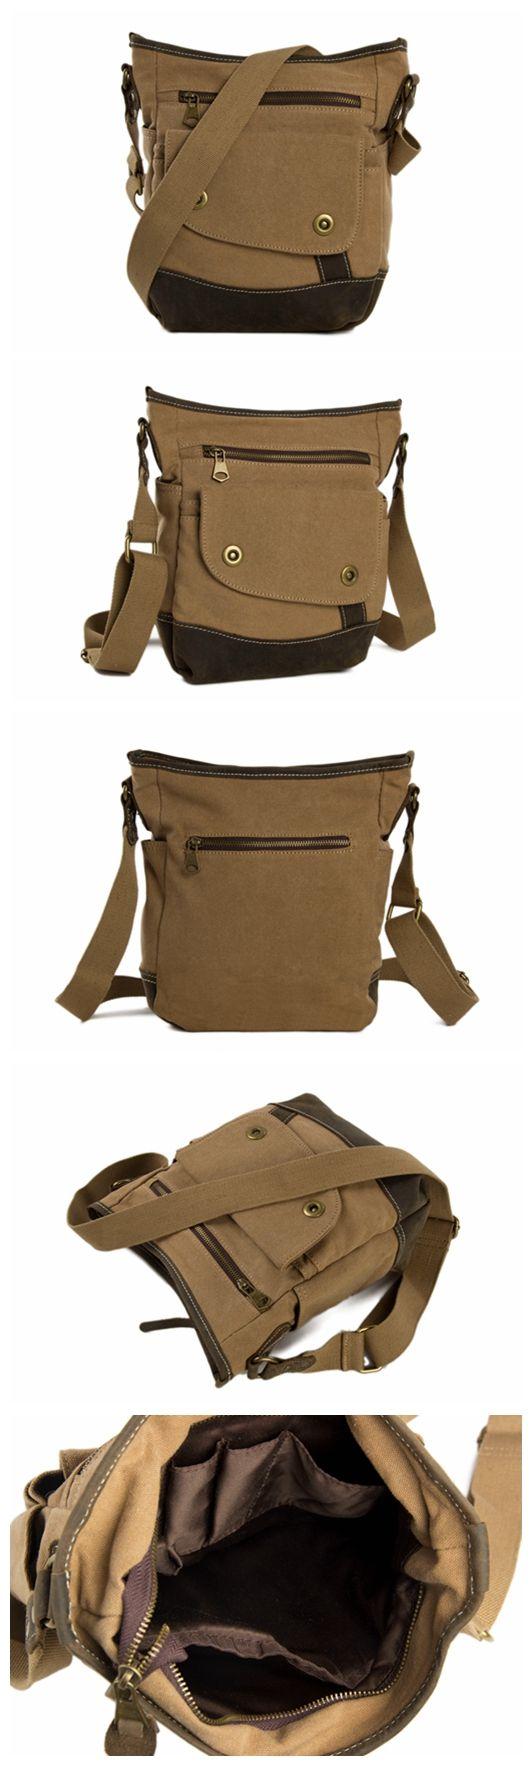 Stylish Canvas Leather Satchel Bag College Shoulder Bag, Waxed Canvas Messenger Bag